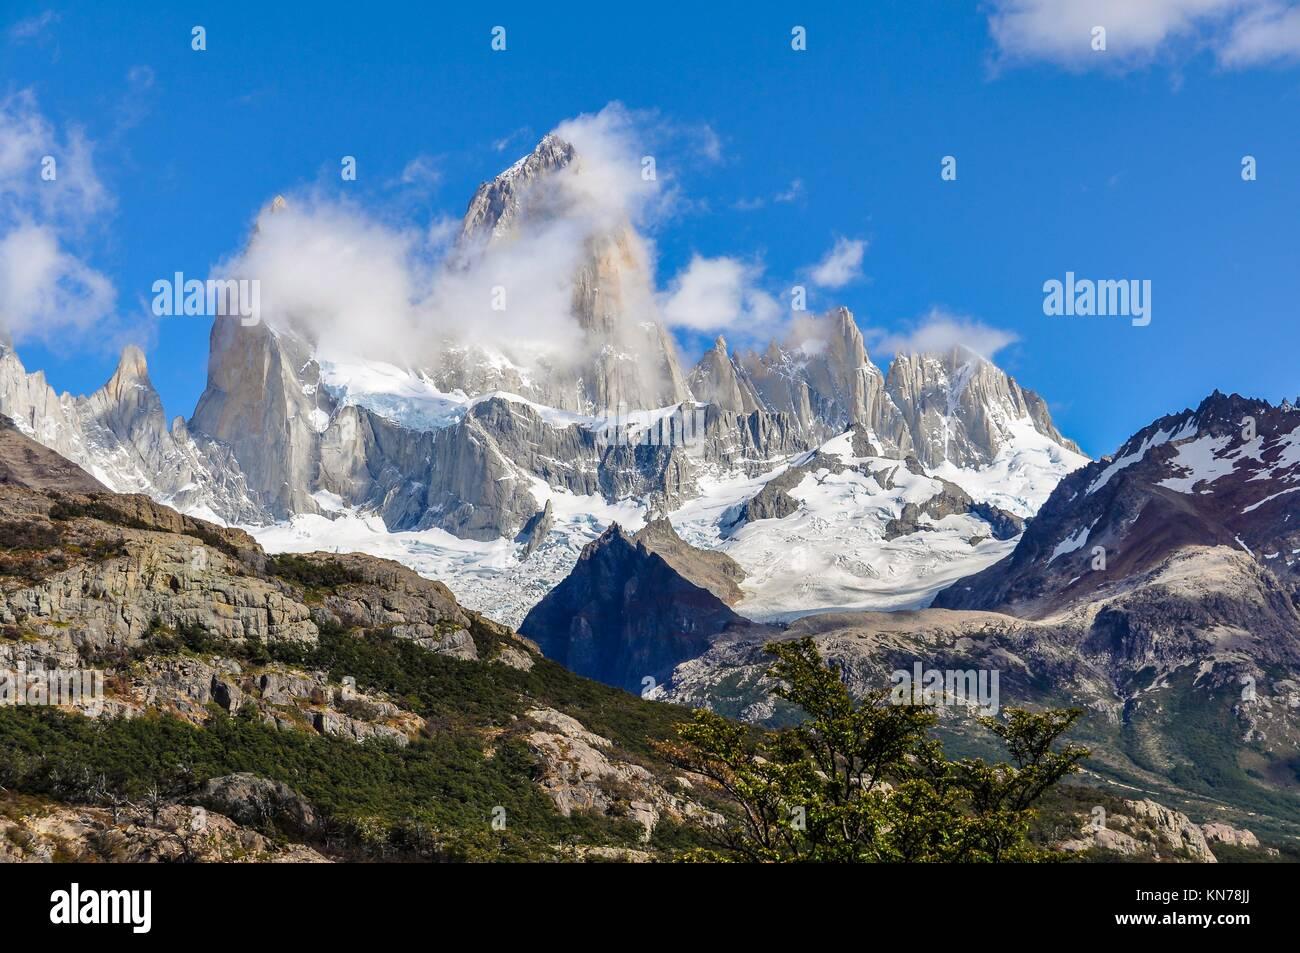 Fitz Roy Walk, El Chalten, Patagonia, Argentina. - Stock Image